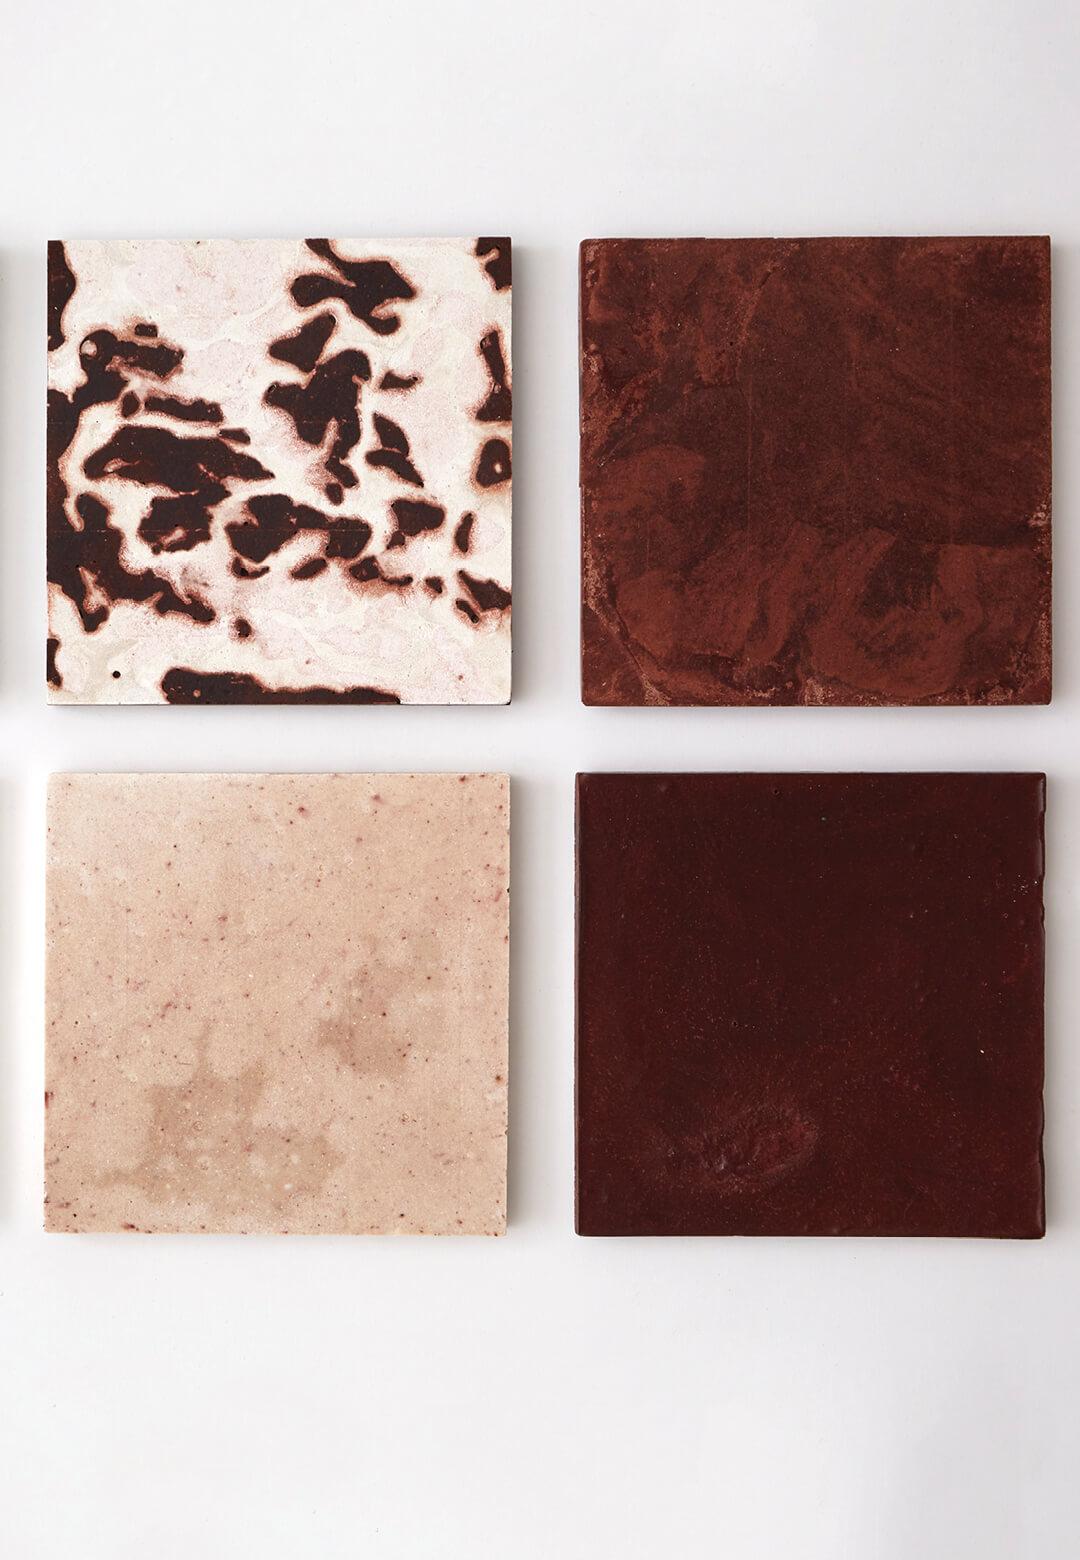 Designer Brigitte Kock and architect Irene Roca Moracia have created a range of new bio-concrete tiles| LVMH Climate Week 2020 | EN ROUTE | Brigitte Kock and Irene Roca Moracia | STIRworld